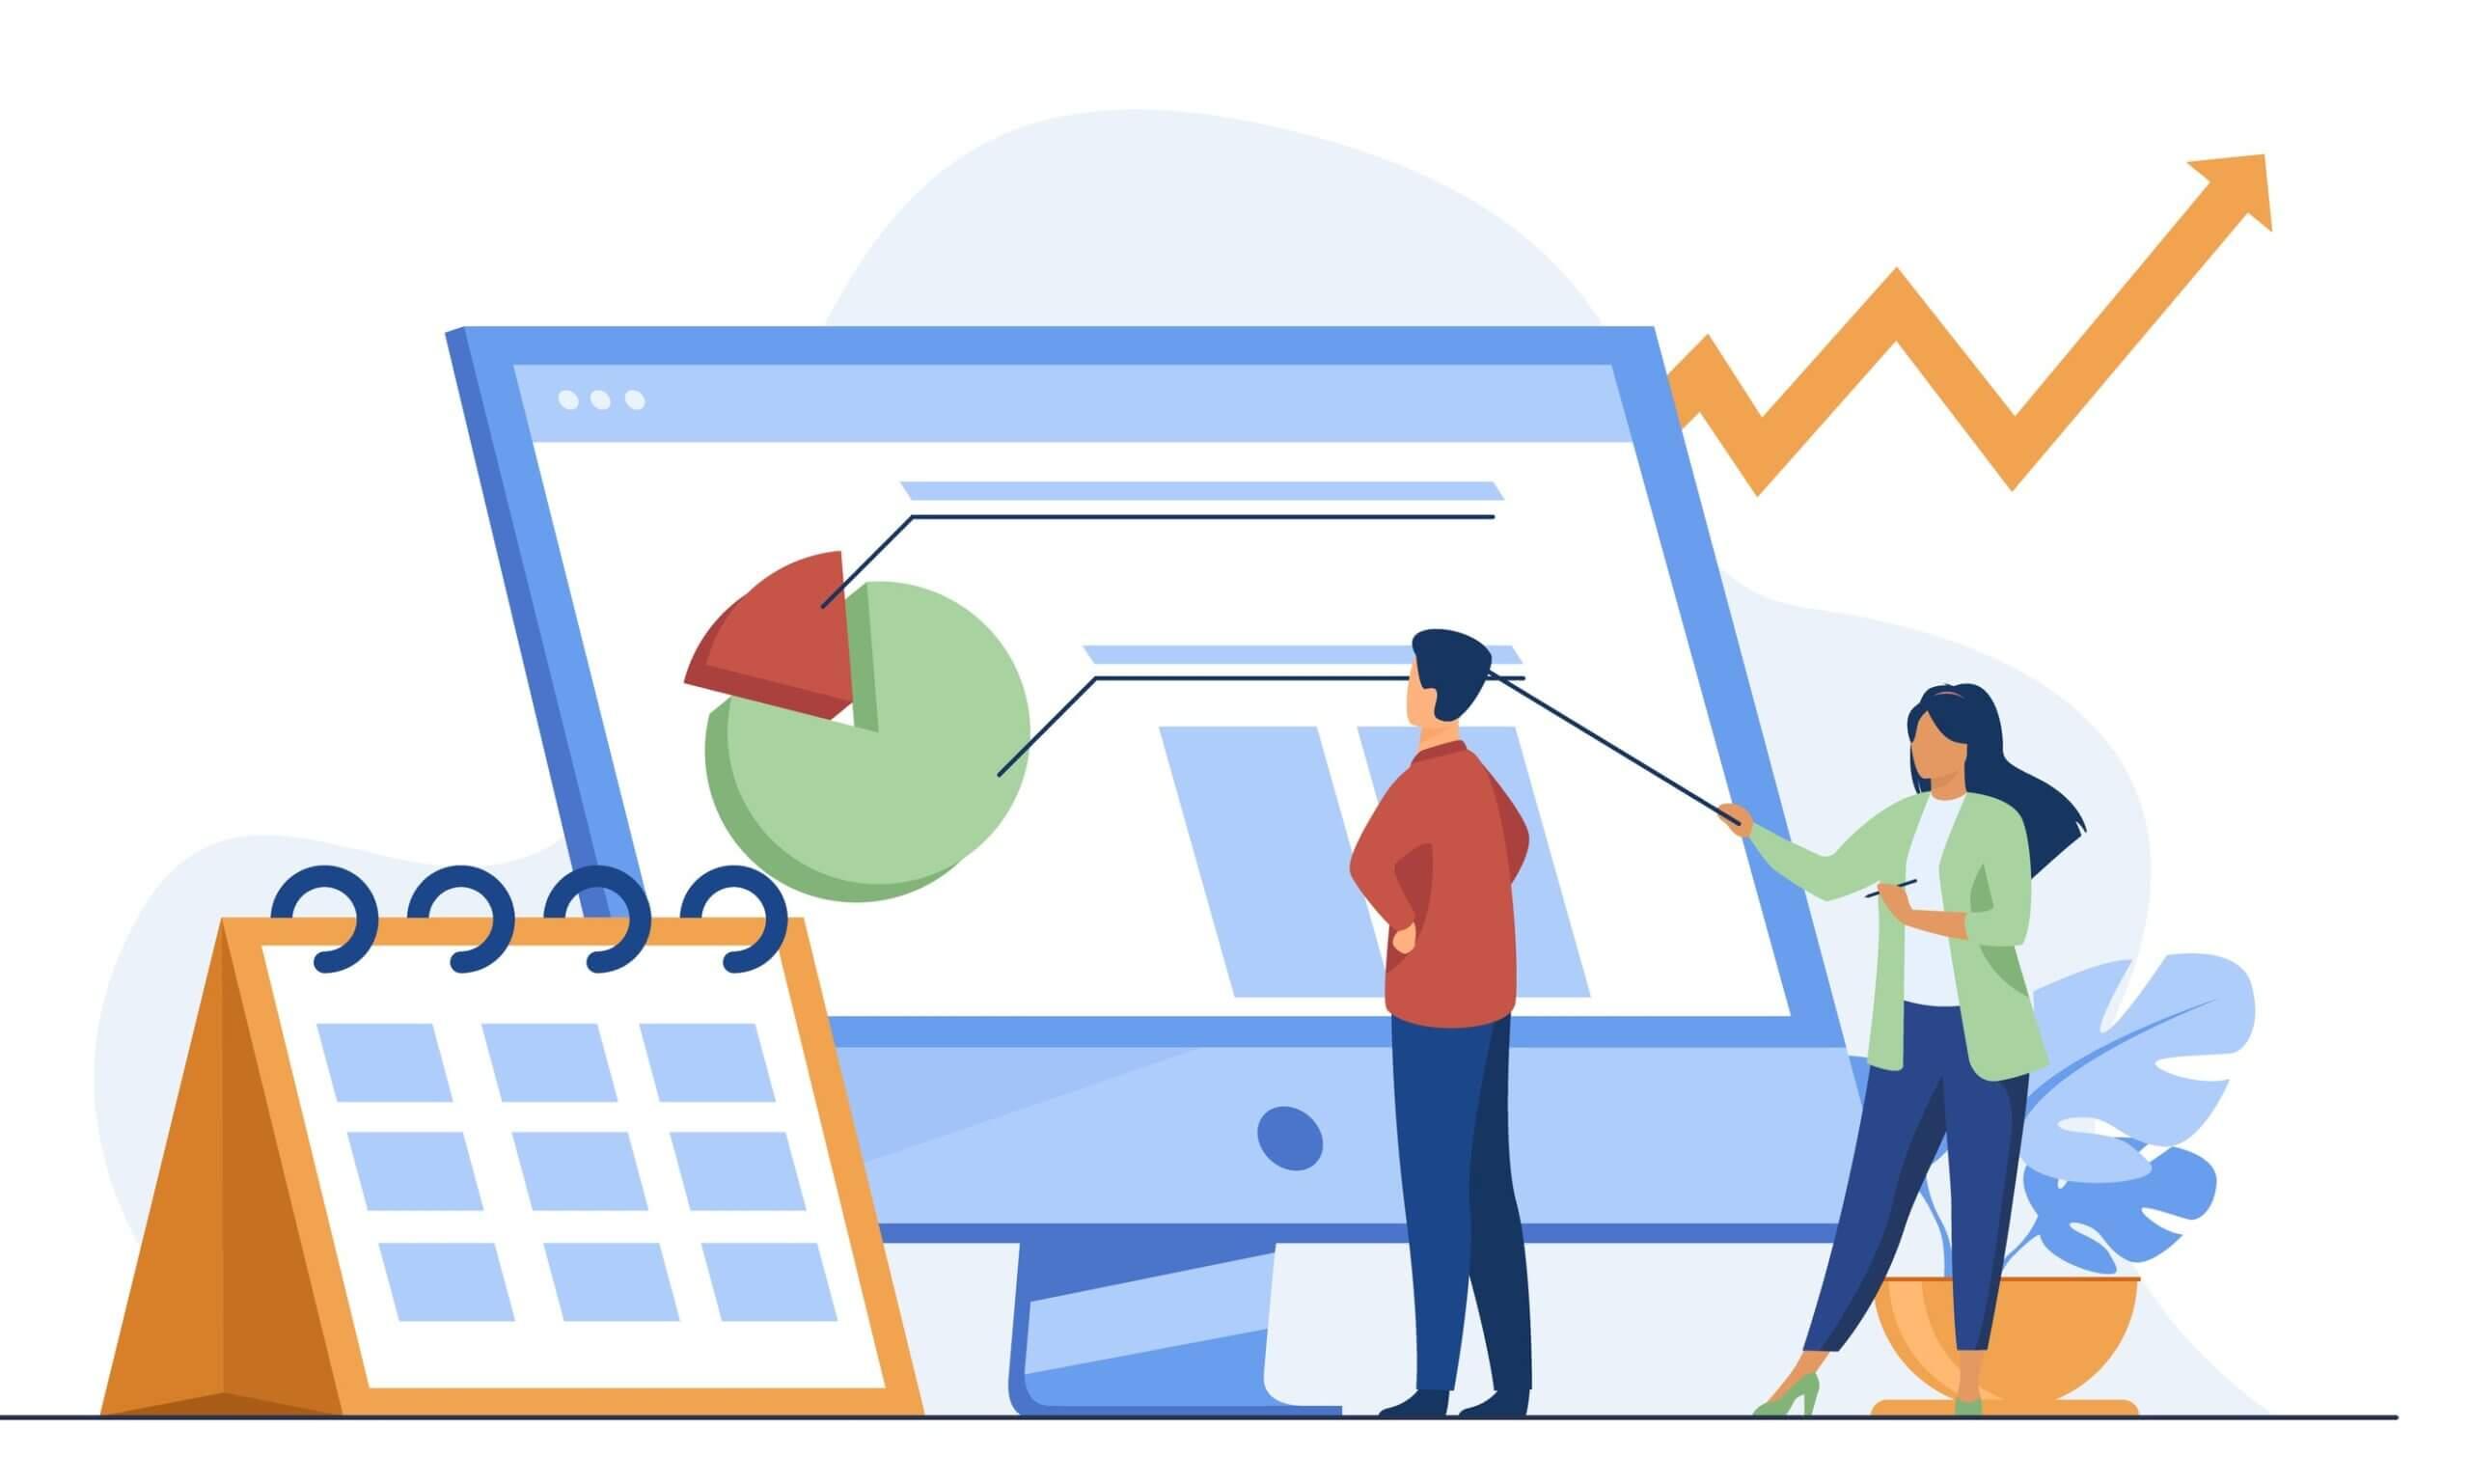 Googleアドセンスの合格するためのポイントを丁寧に解説